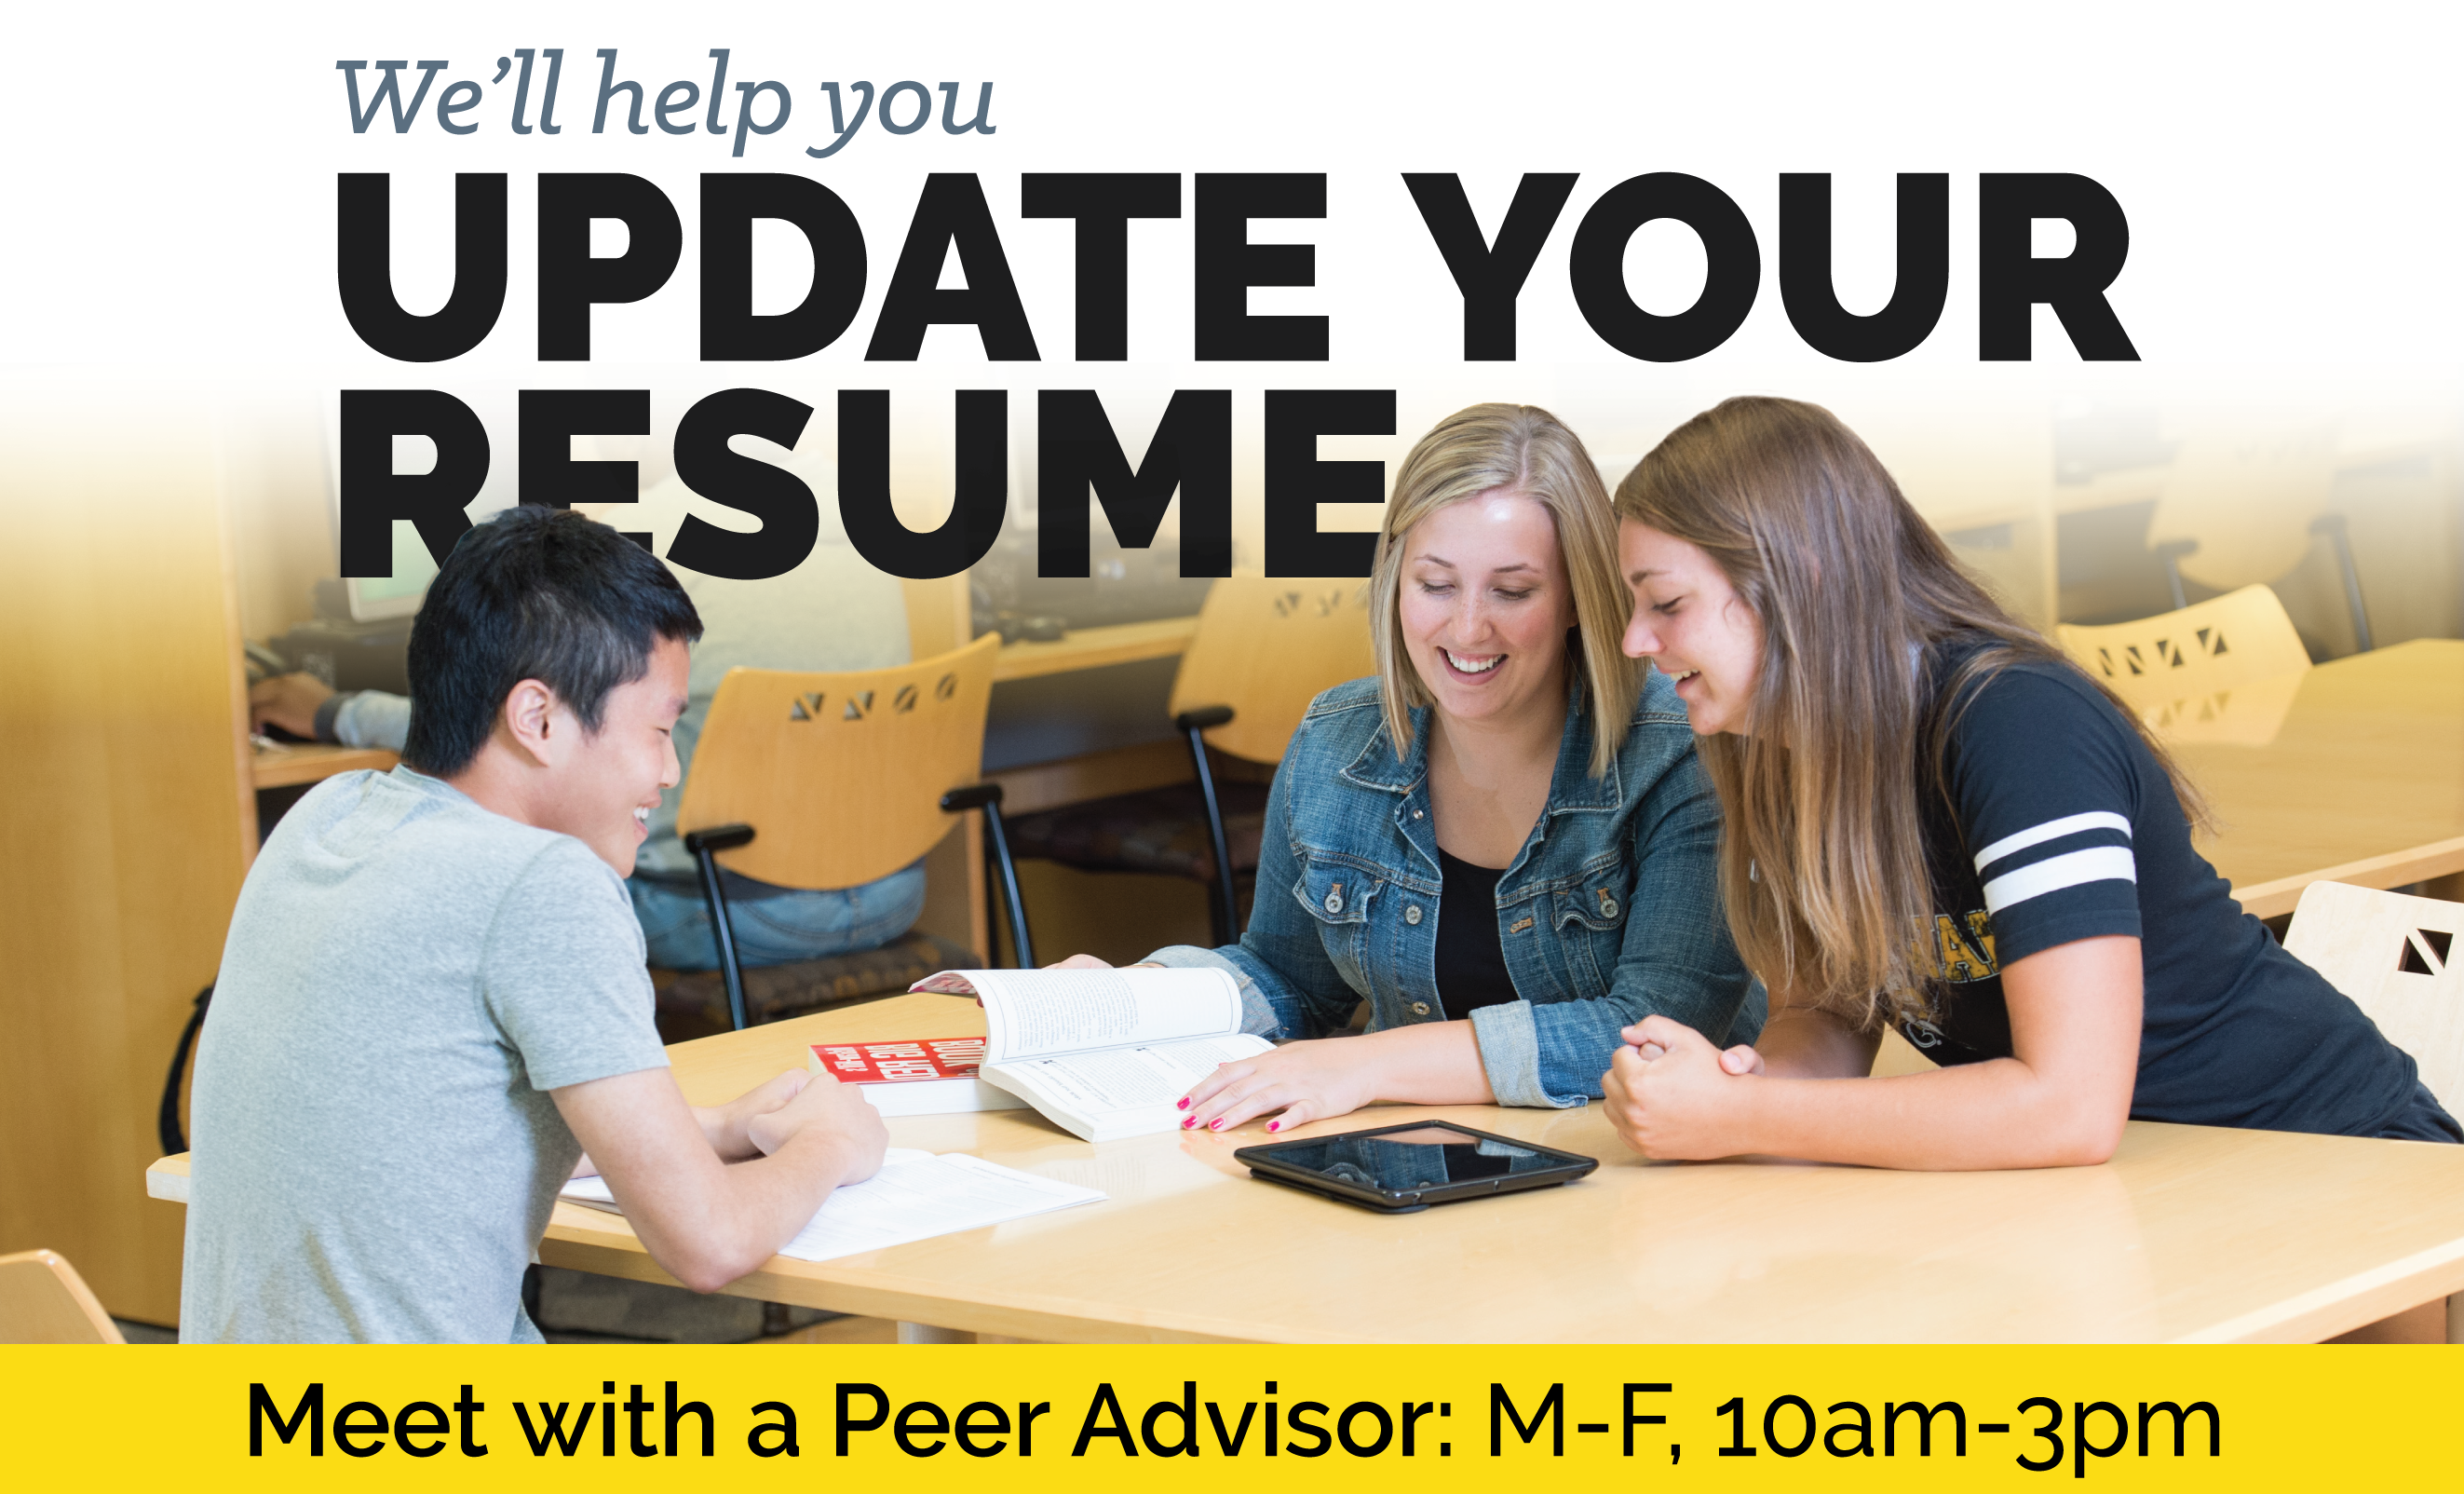 Peer Advisors